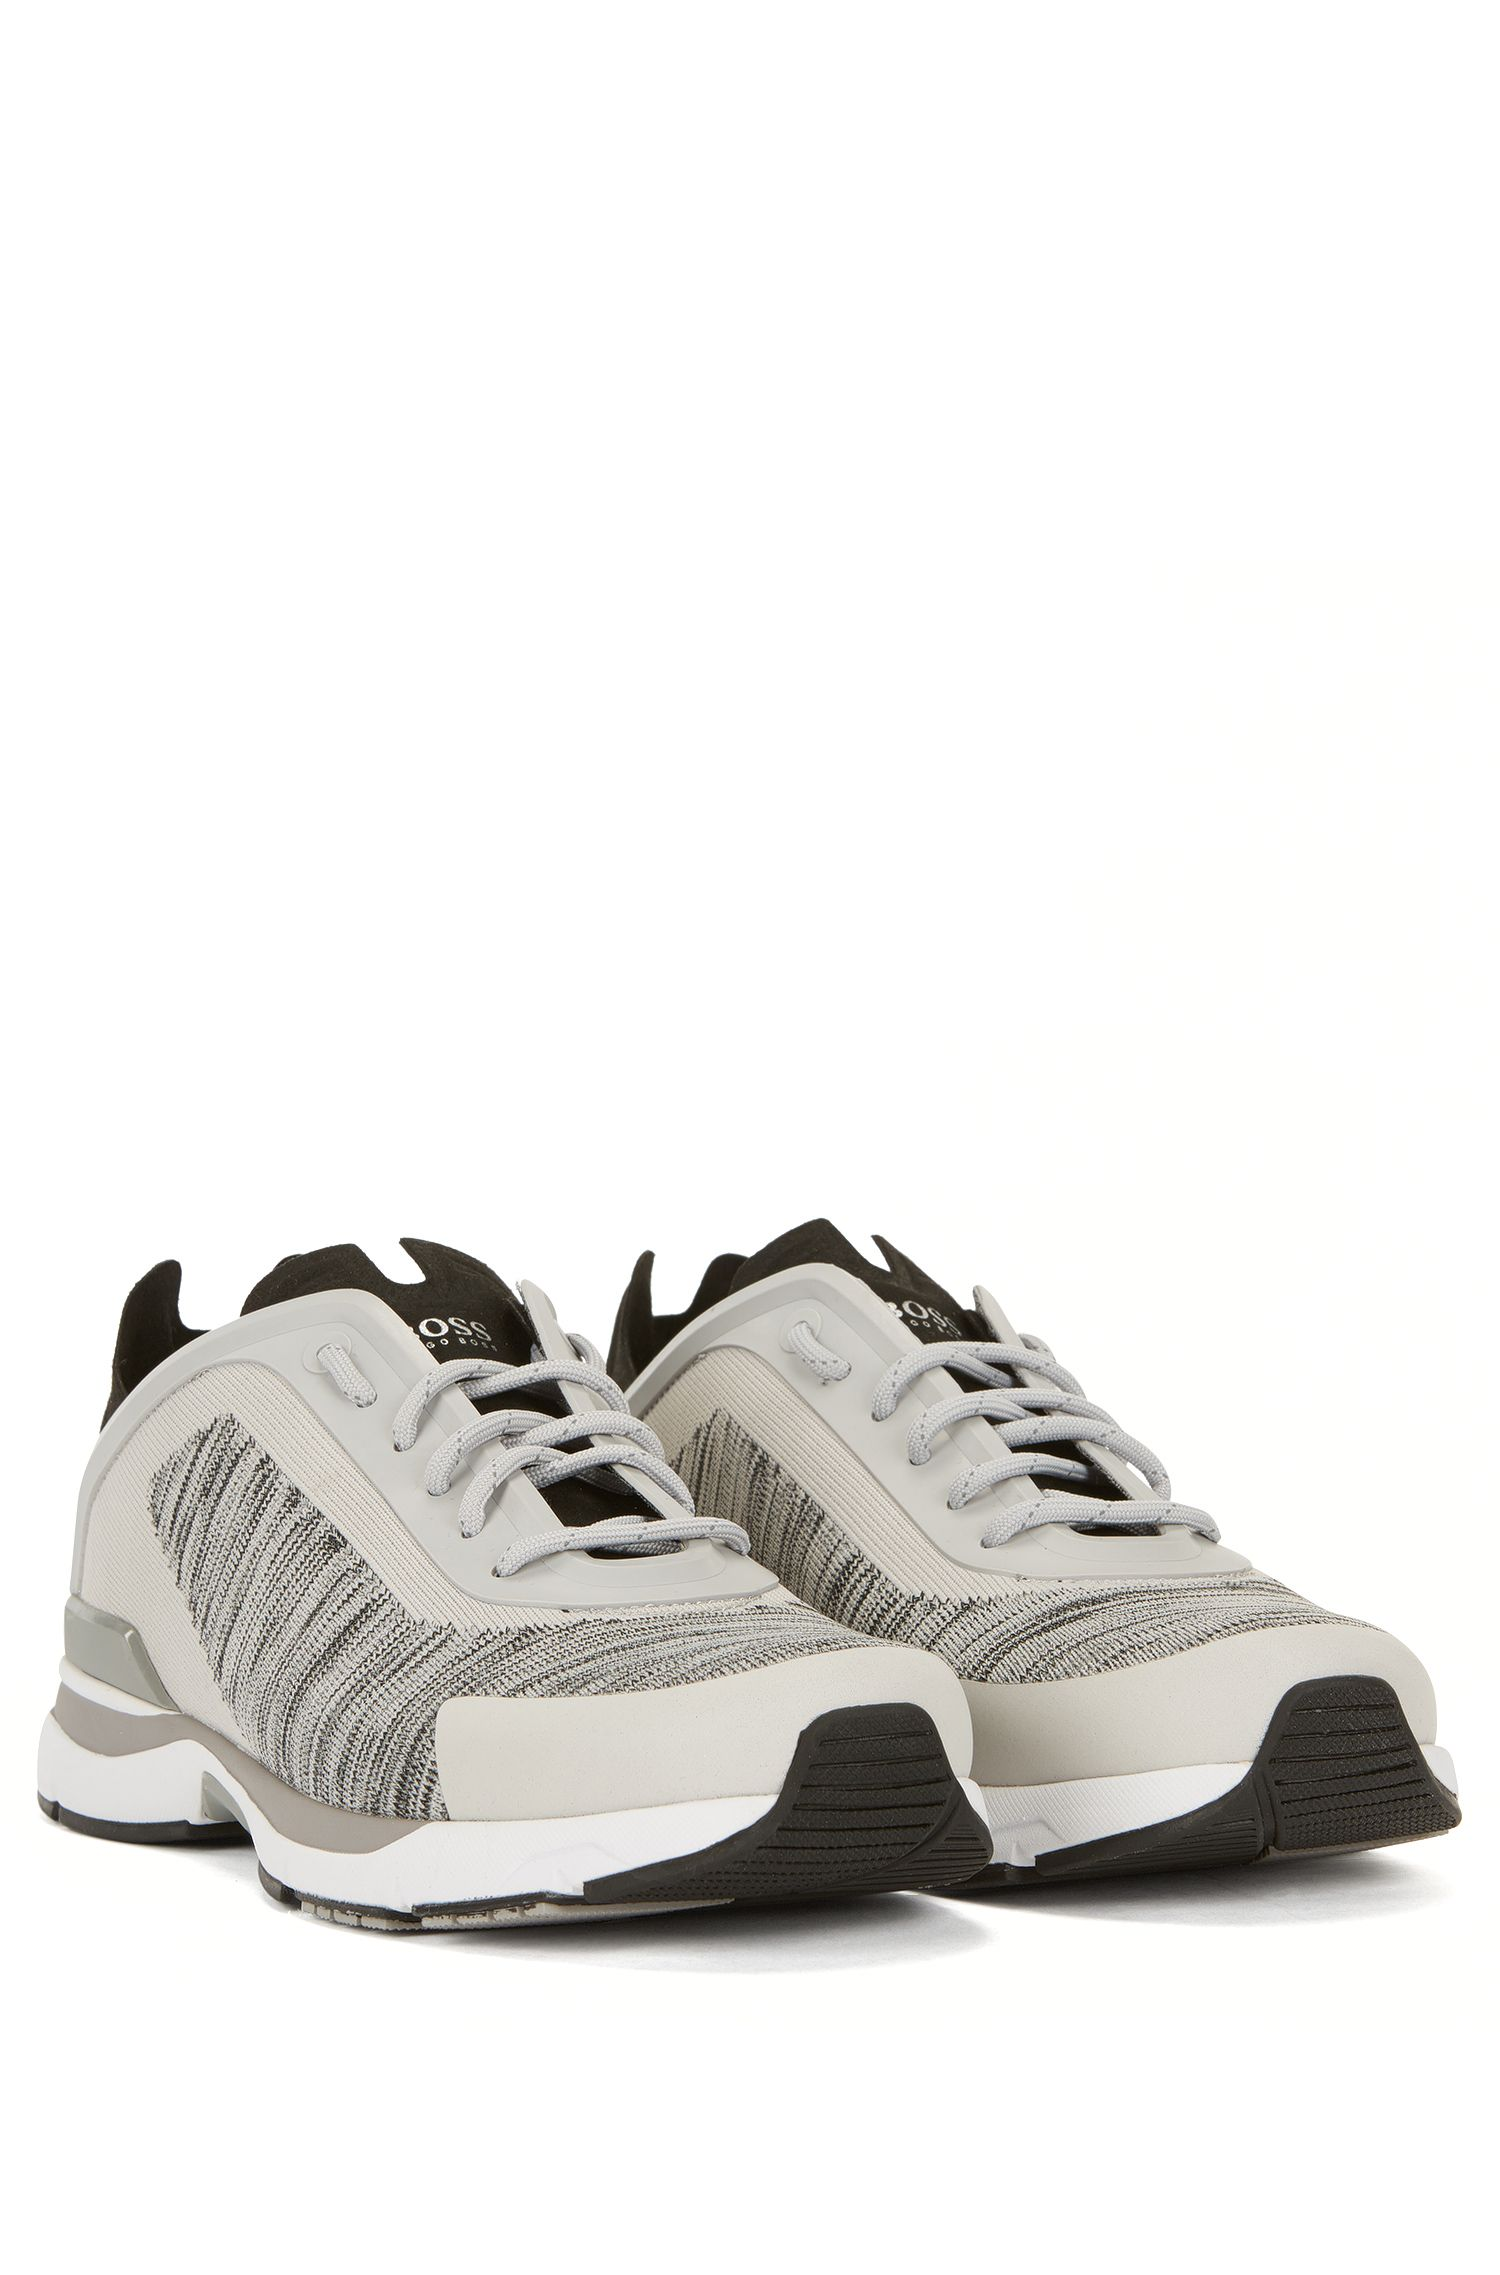 Sneakers in stile runner con tomaia in maglia jacquard